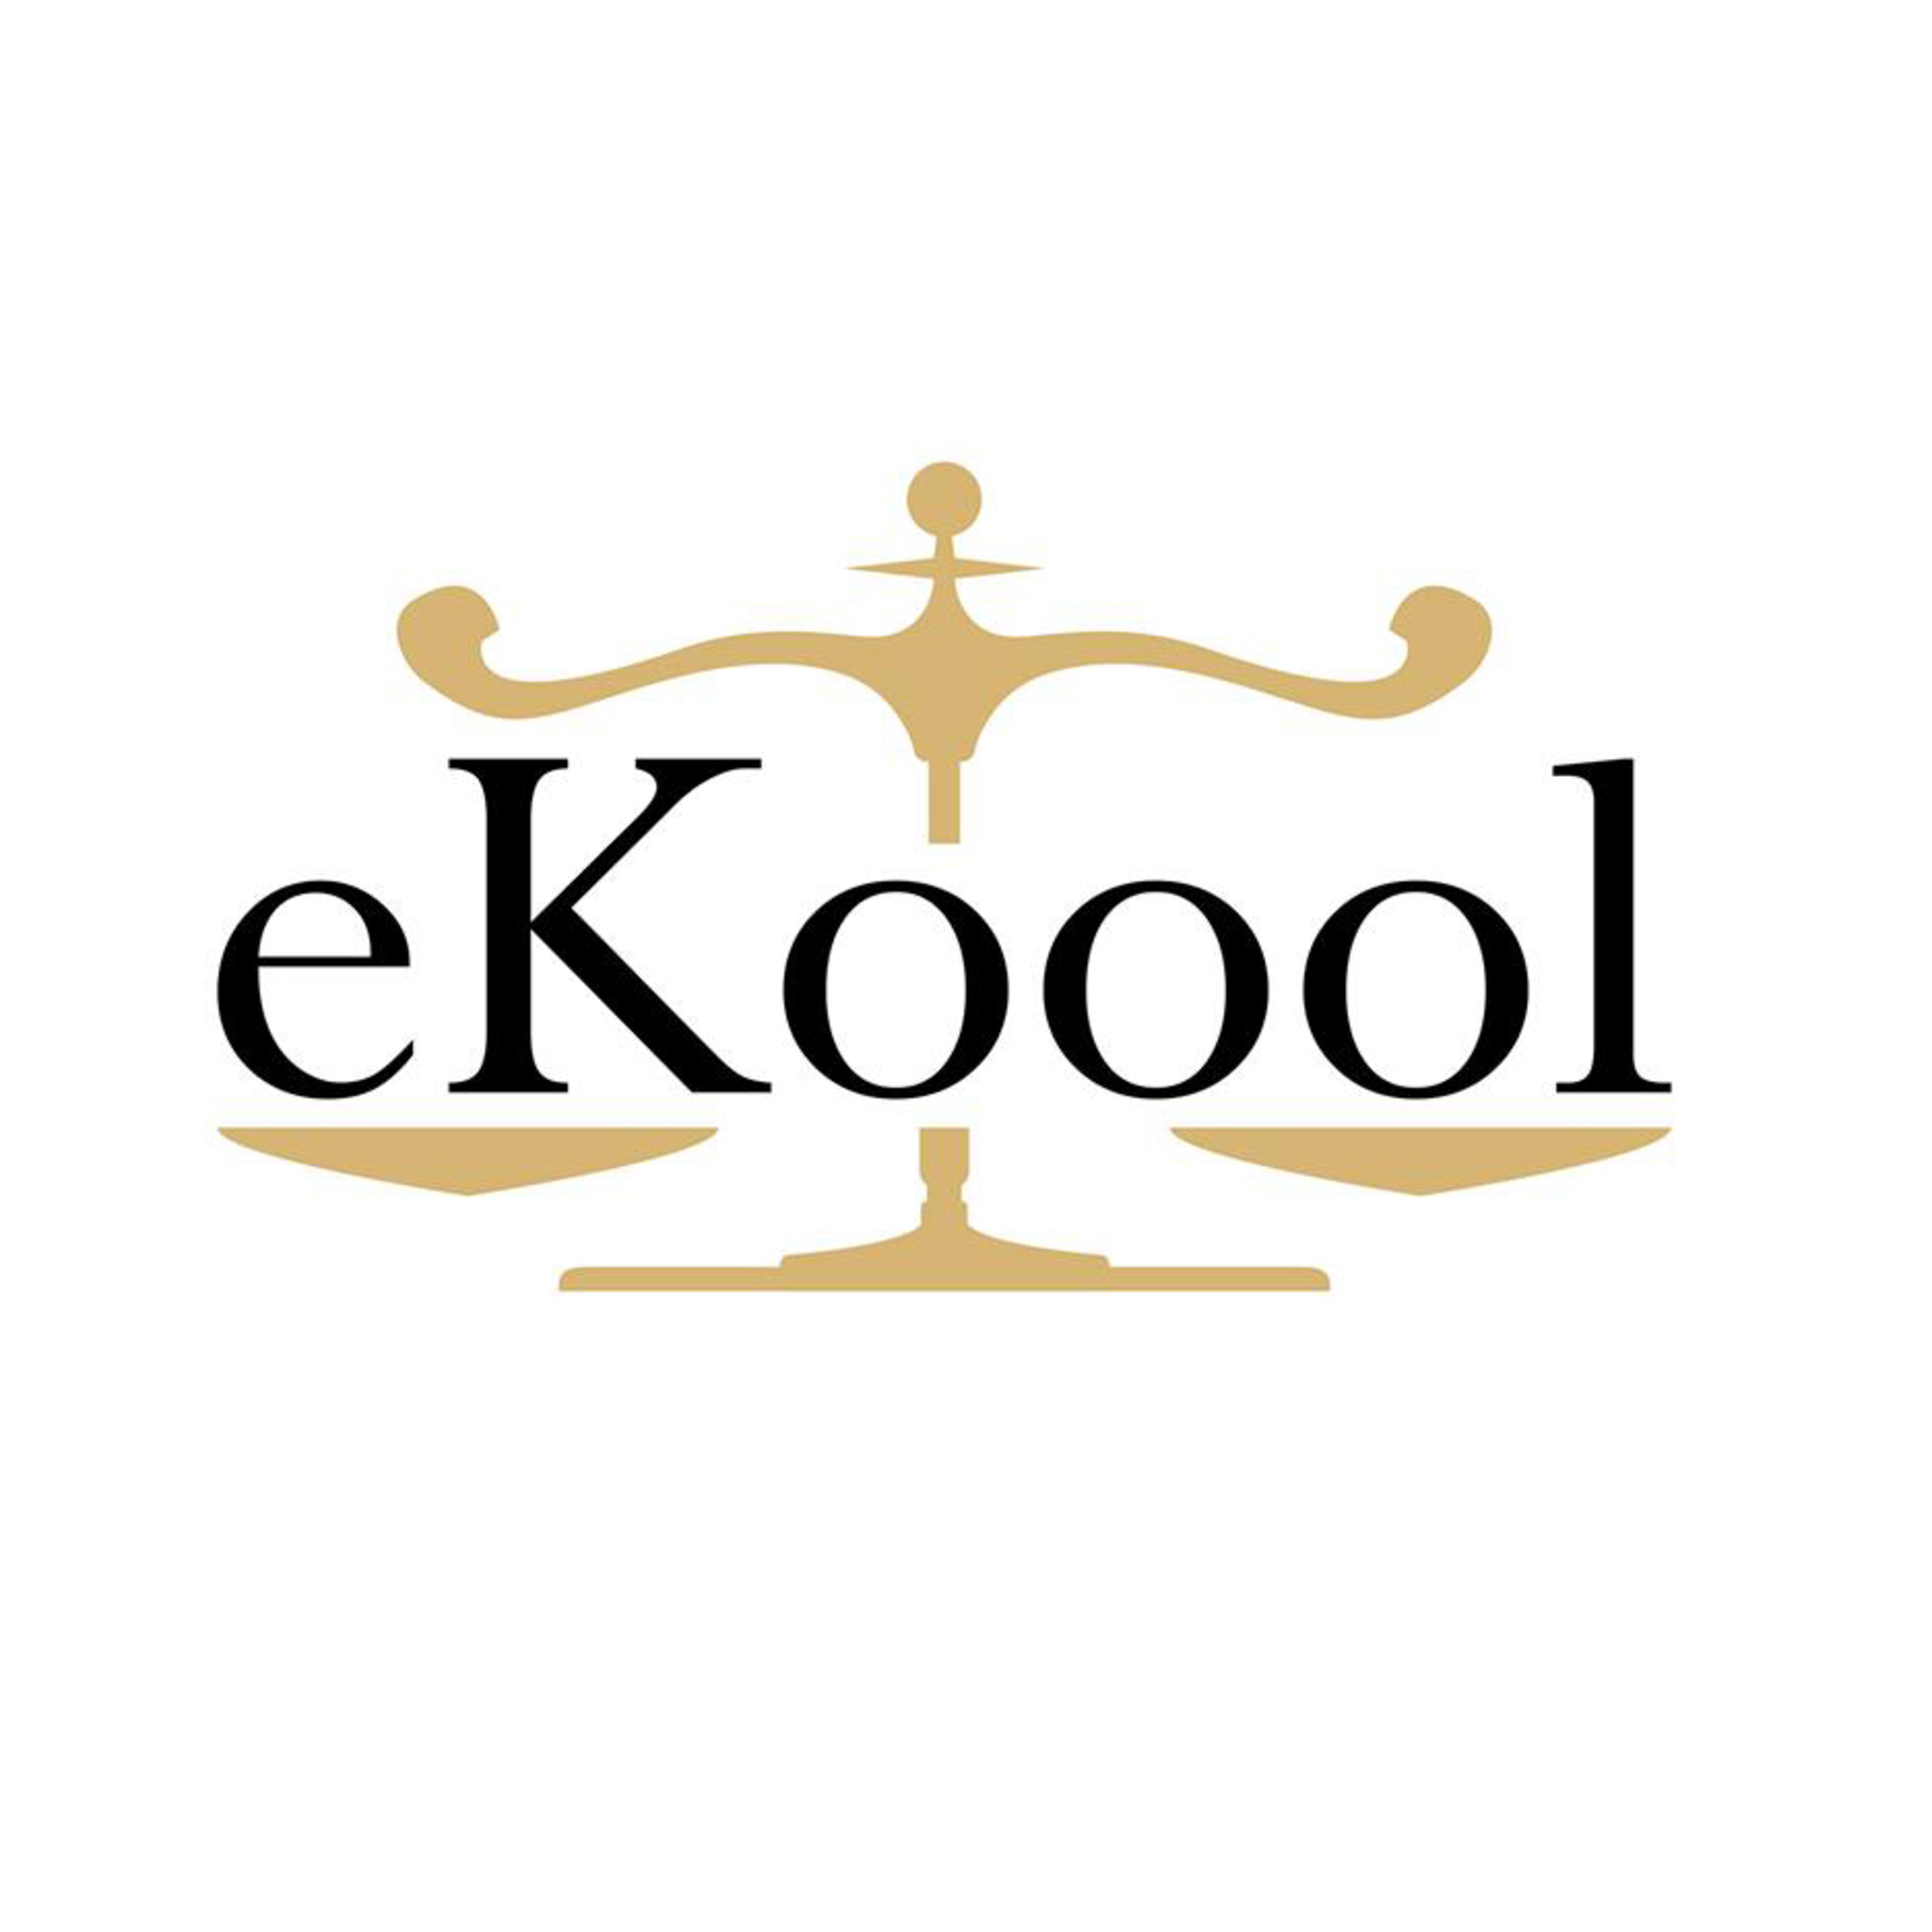 ekoool com- company logo